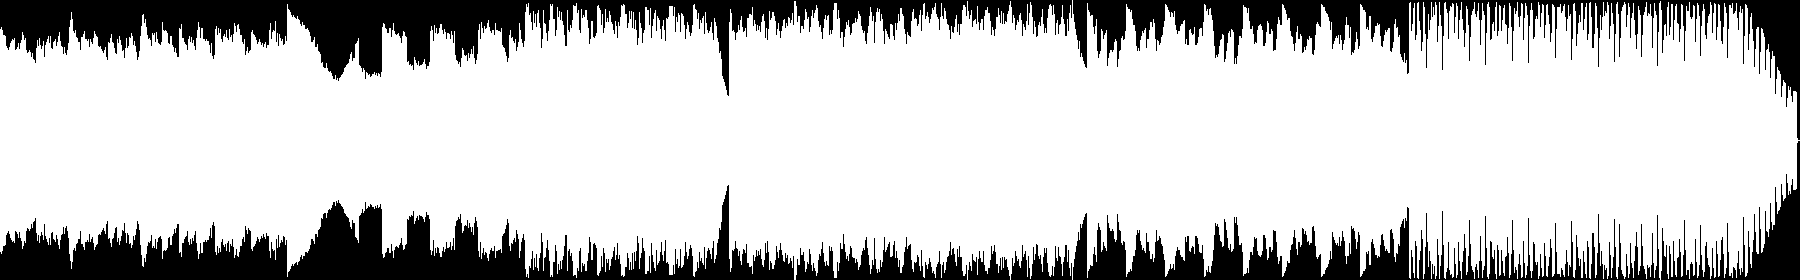 Cinematic Electronica audio waveform